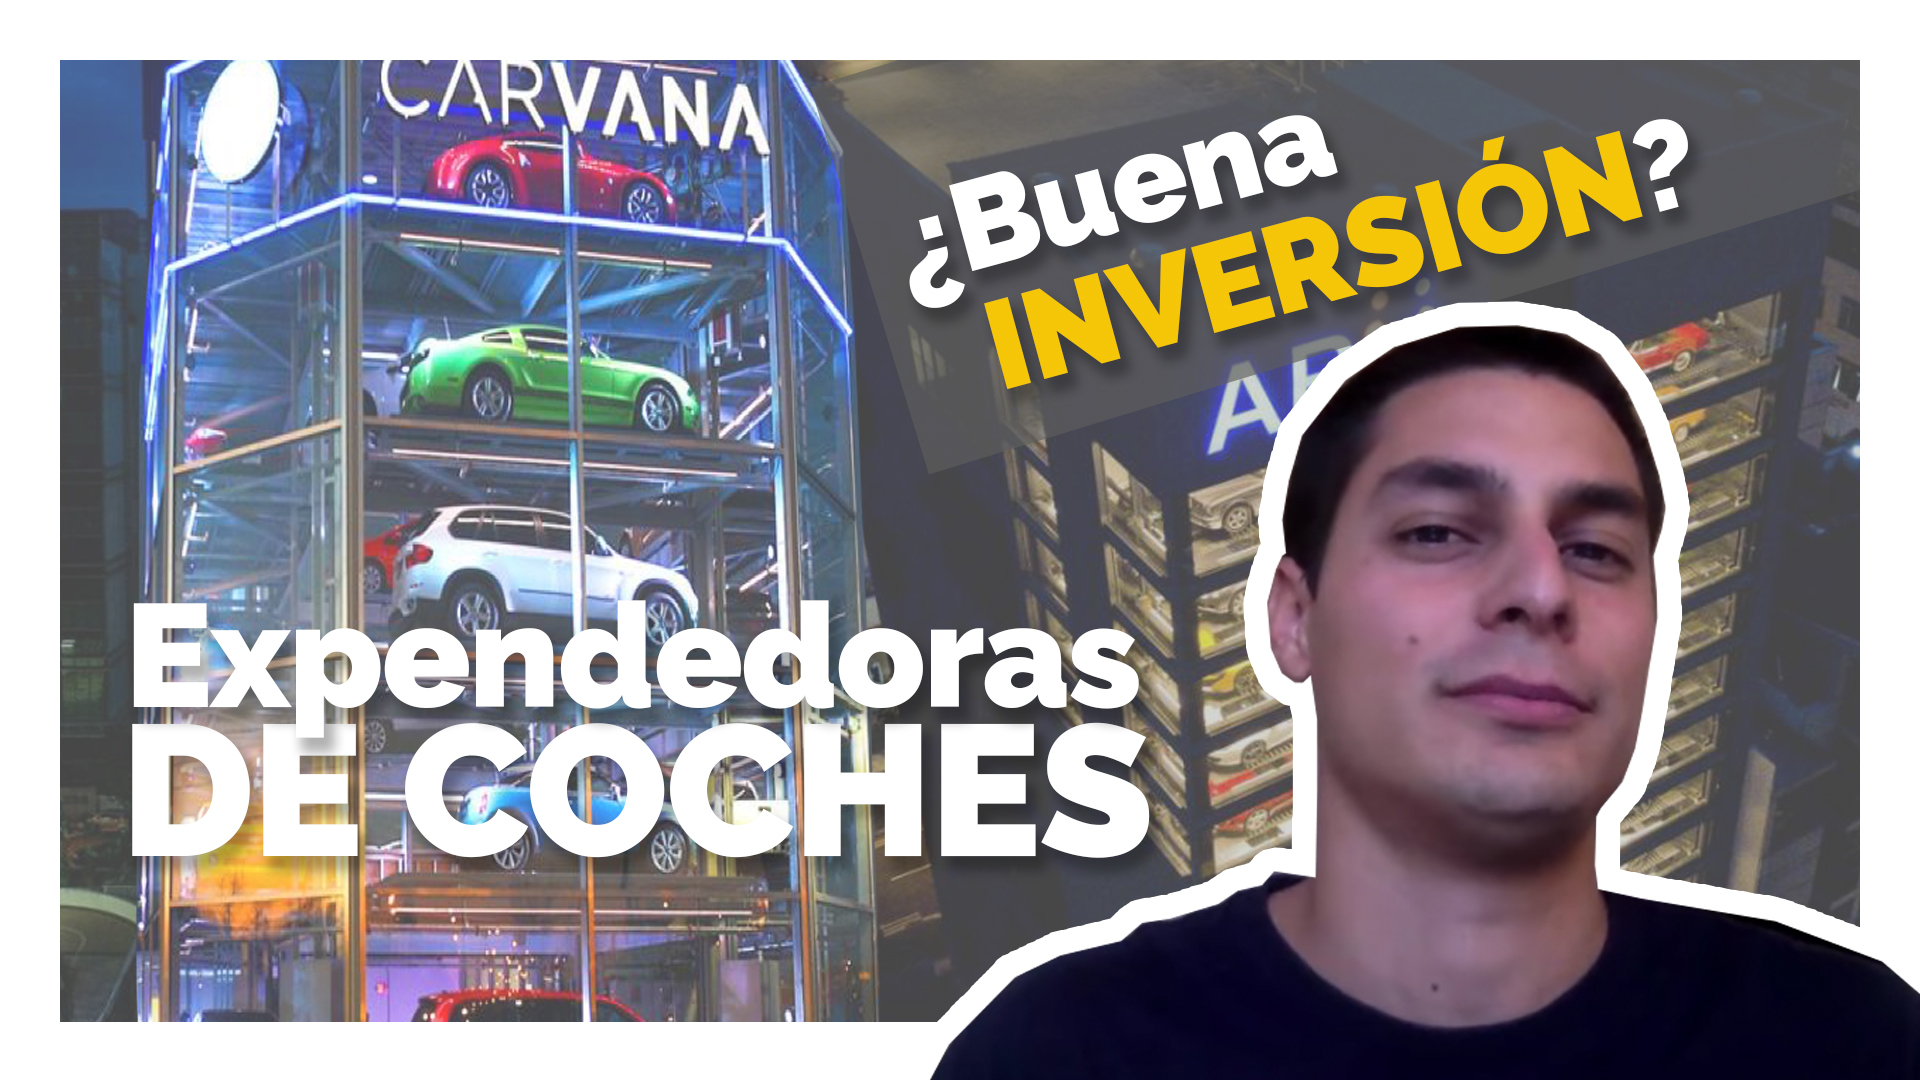 Máquinas Expendedoras De Coches… Buena Inversión??